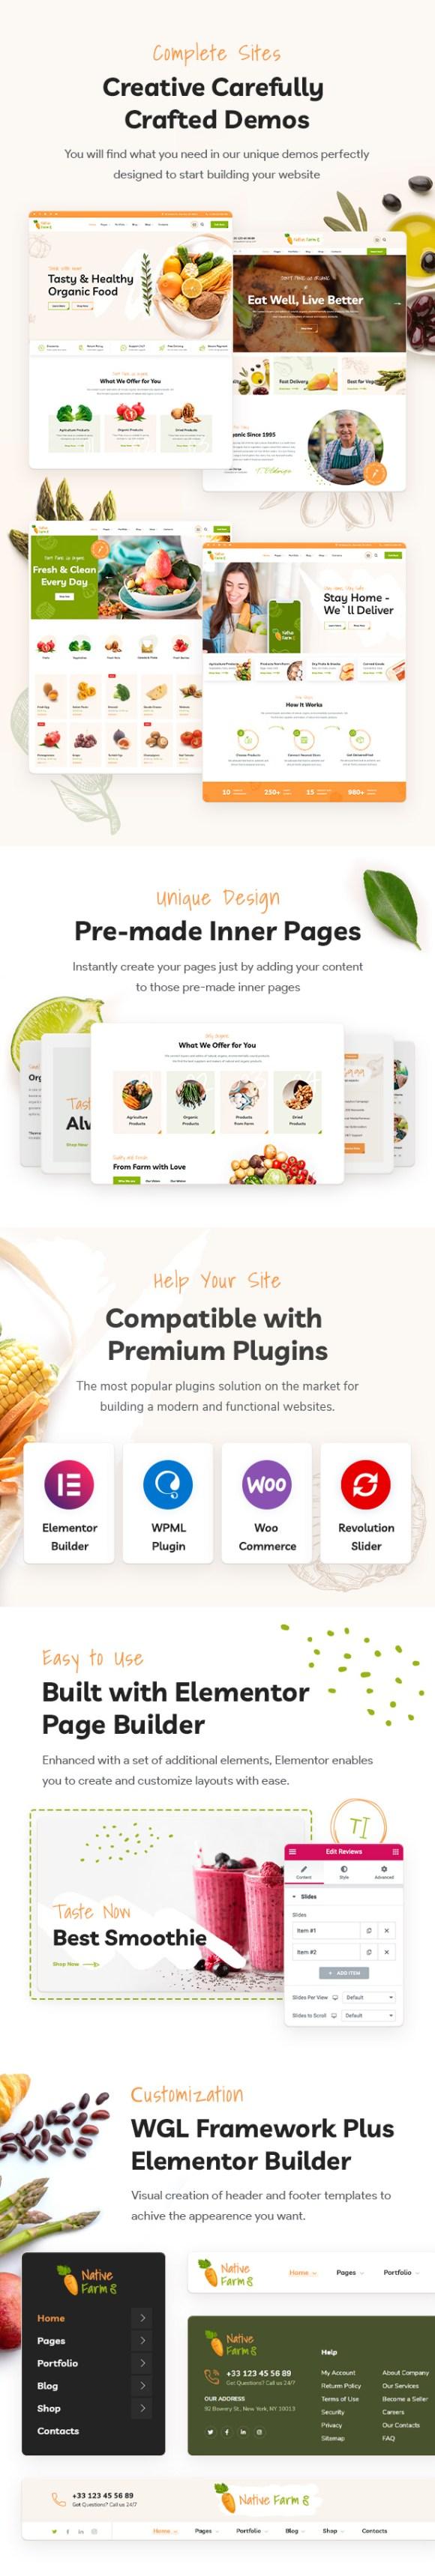 NativeFarm - Organic & Healthy Food WordPress Theme - 1